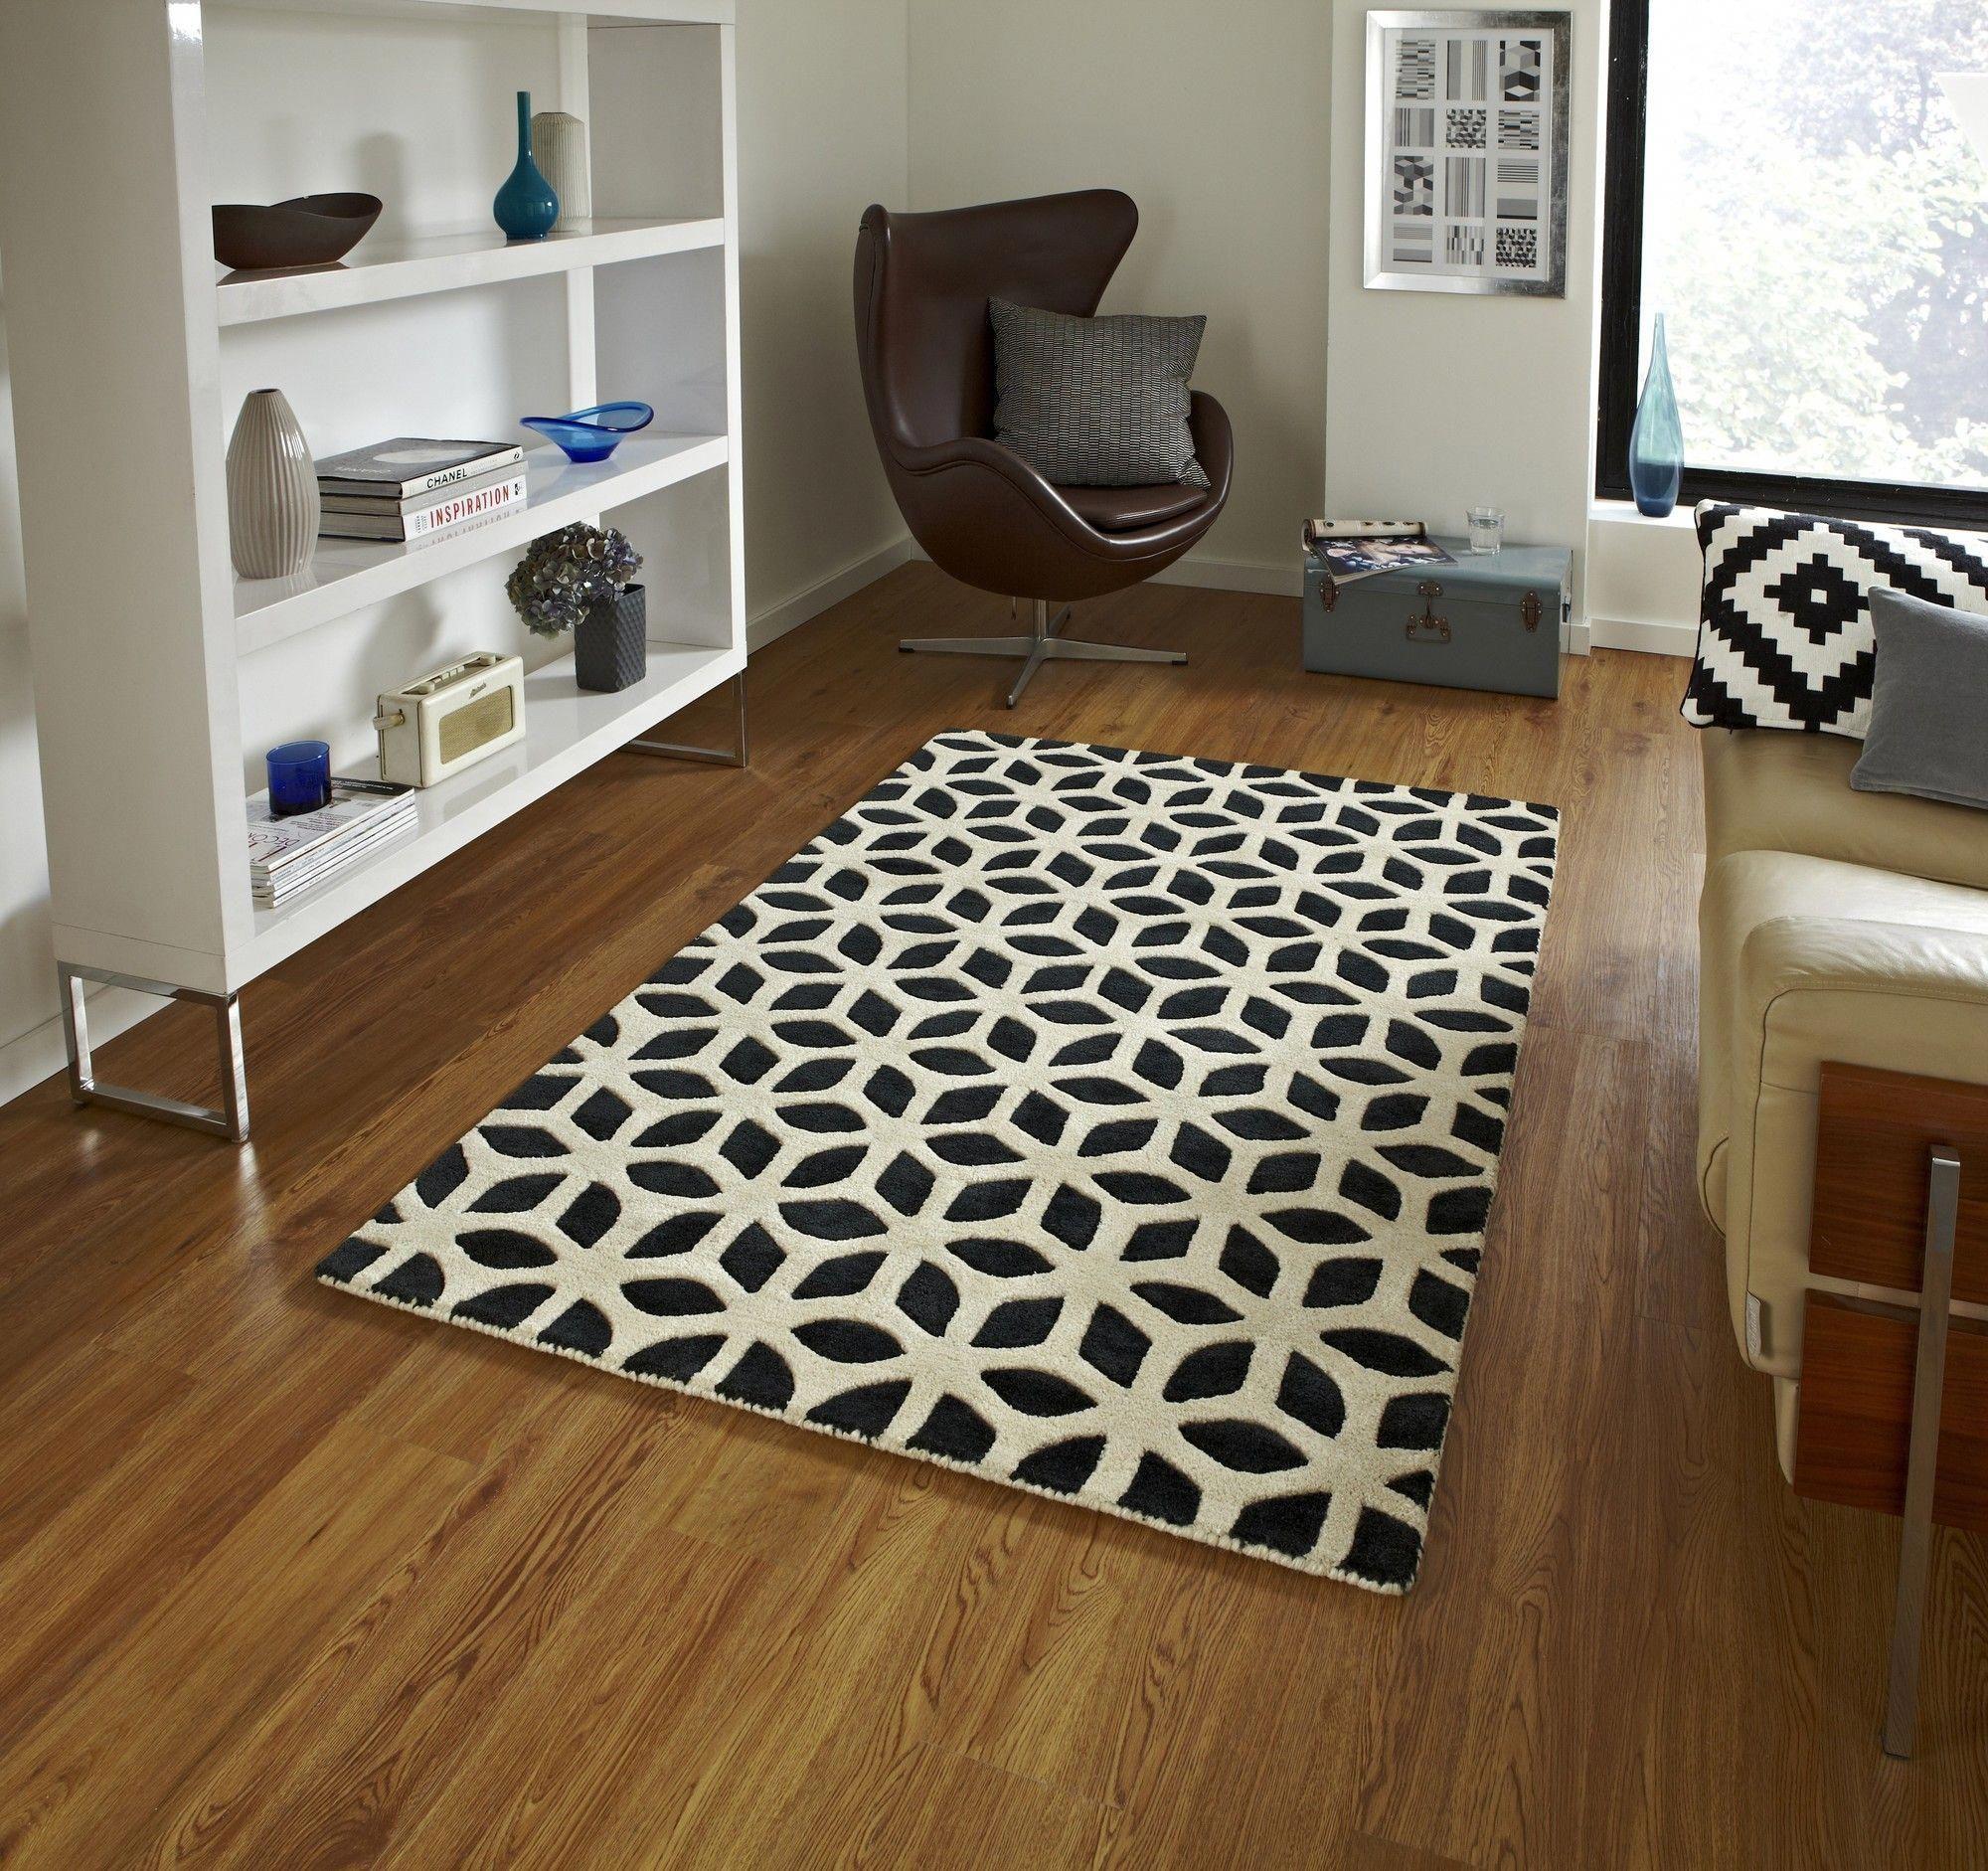 Online Carpets Uk >> Fusion Black Cream Tufted Rug Wayfair Uk